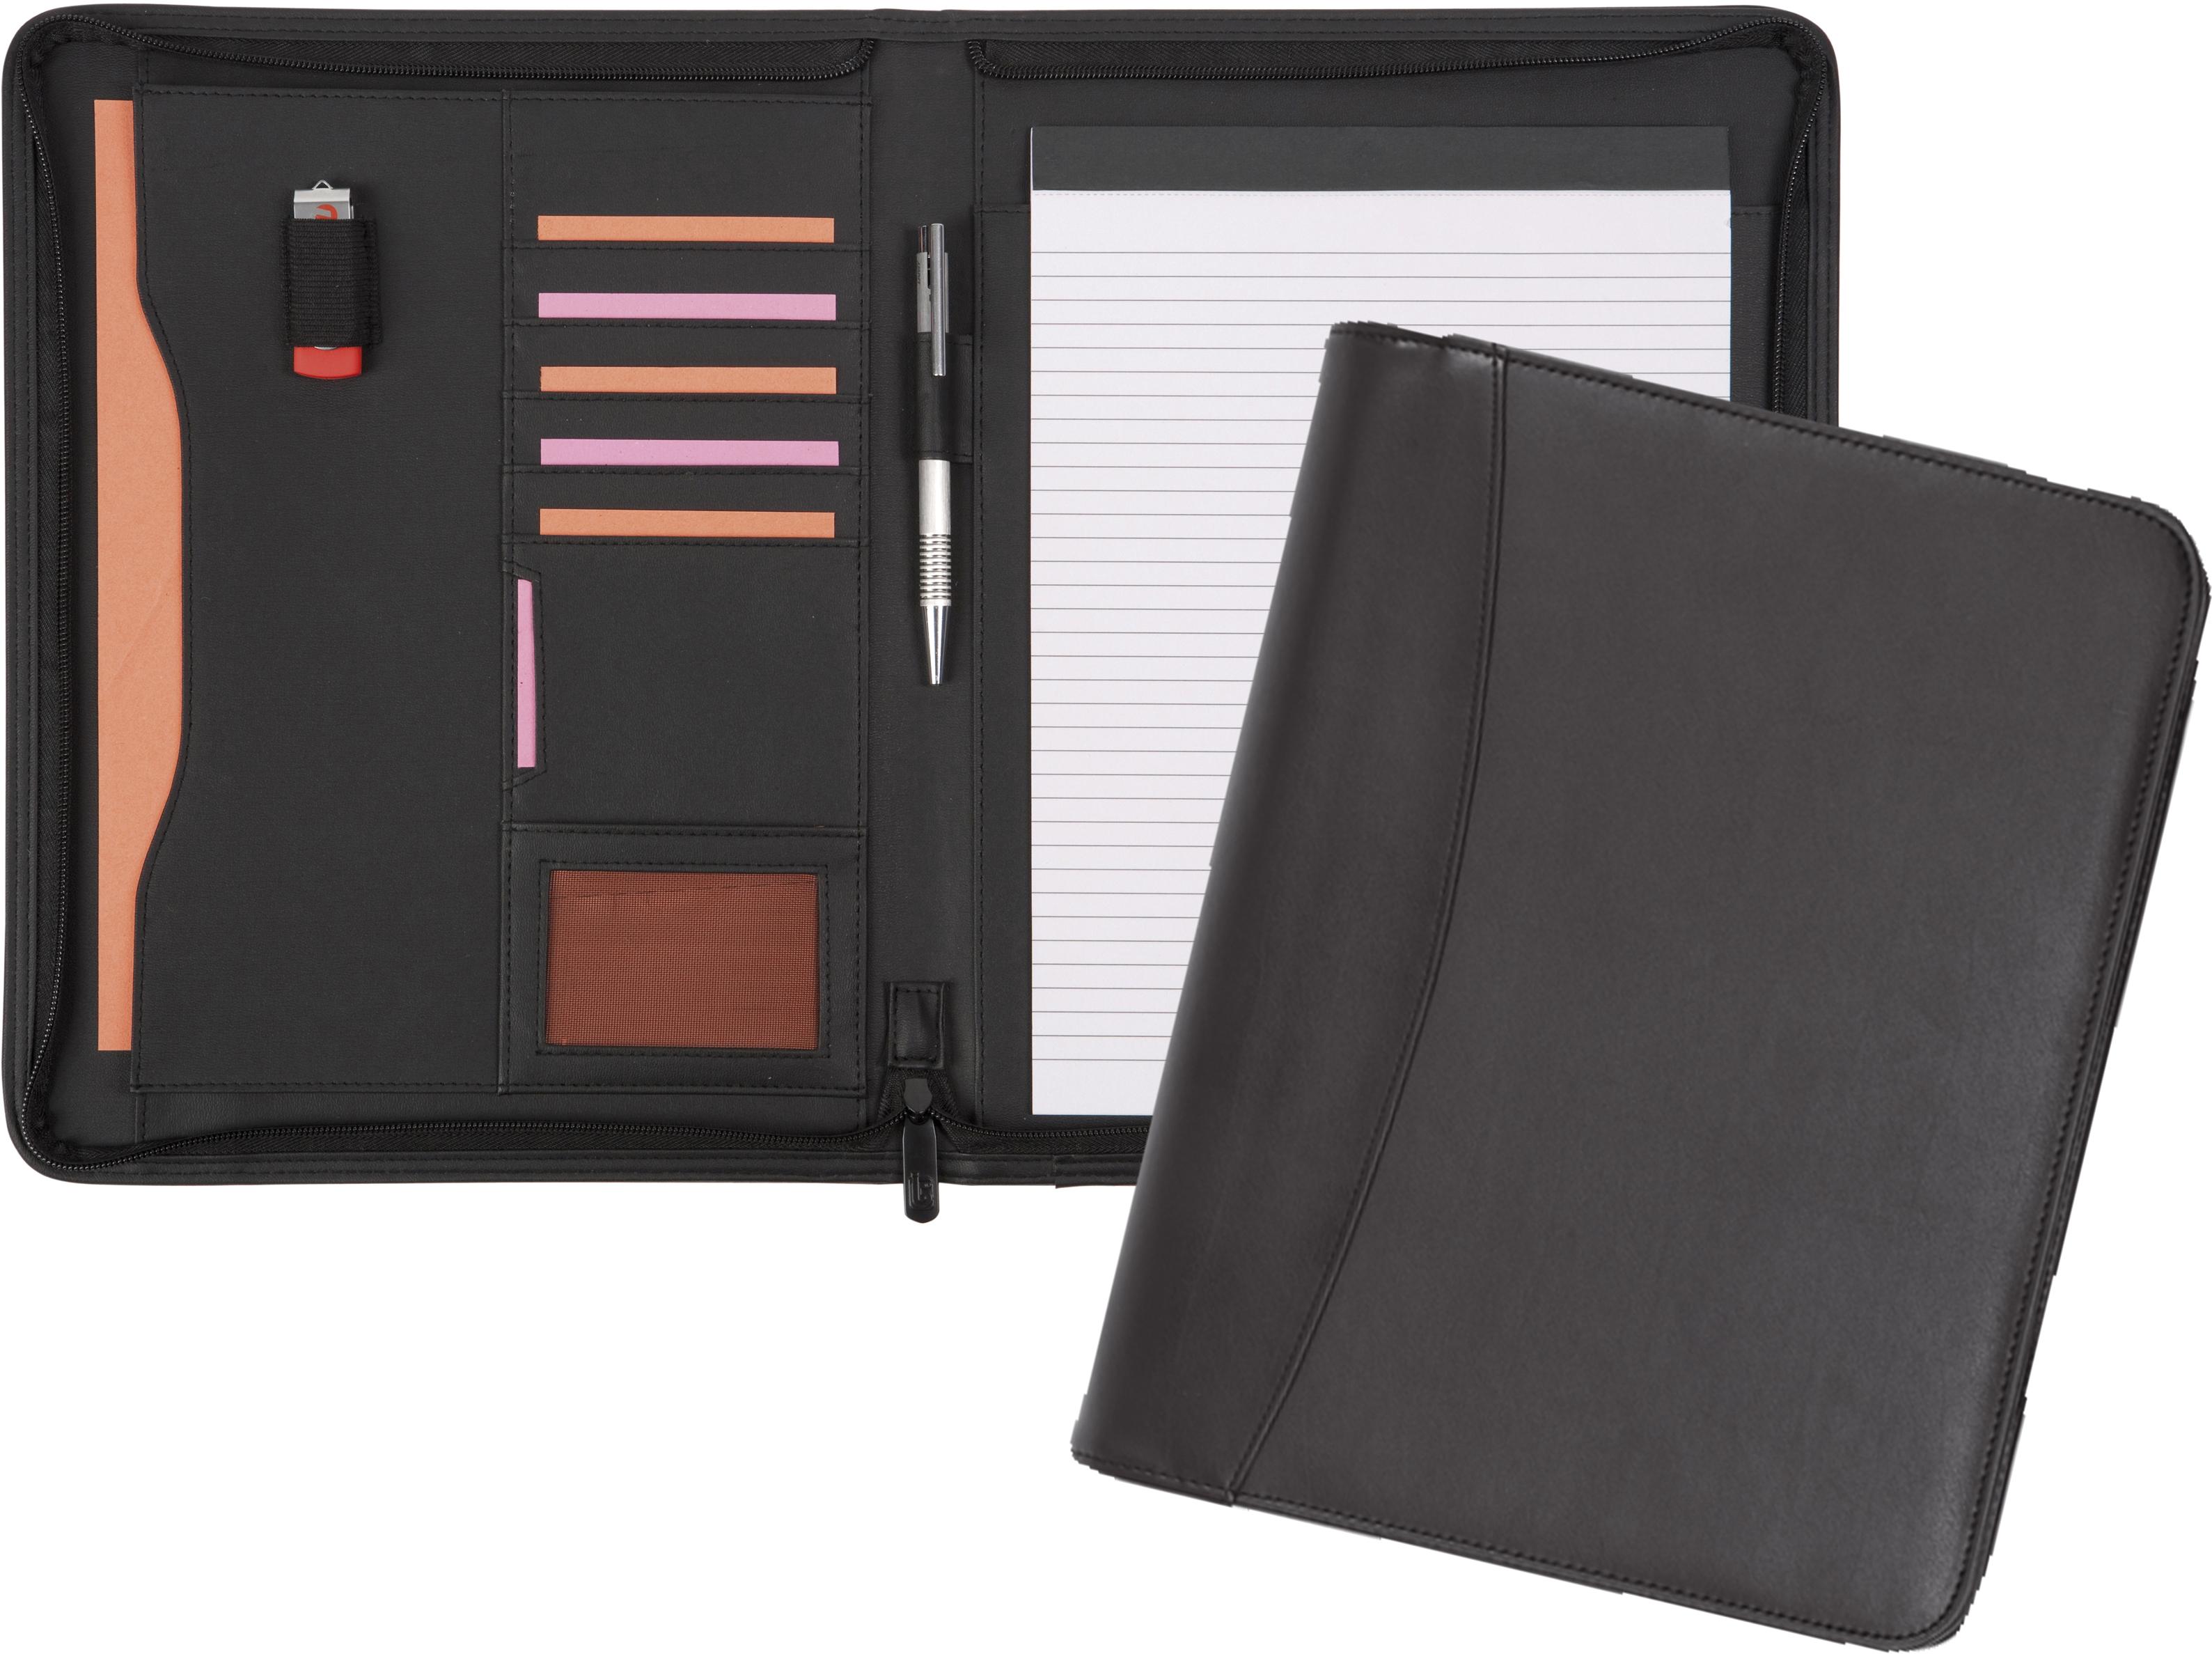 Promotional Pembury Zipped Conf Folder Oversized A4